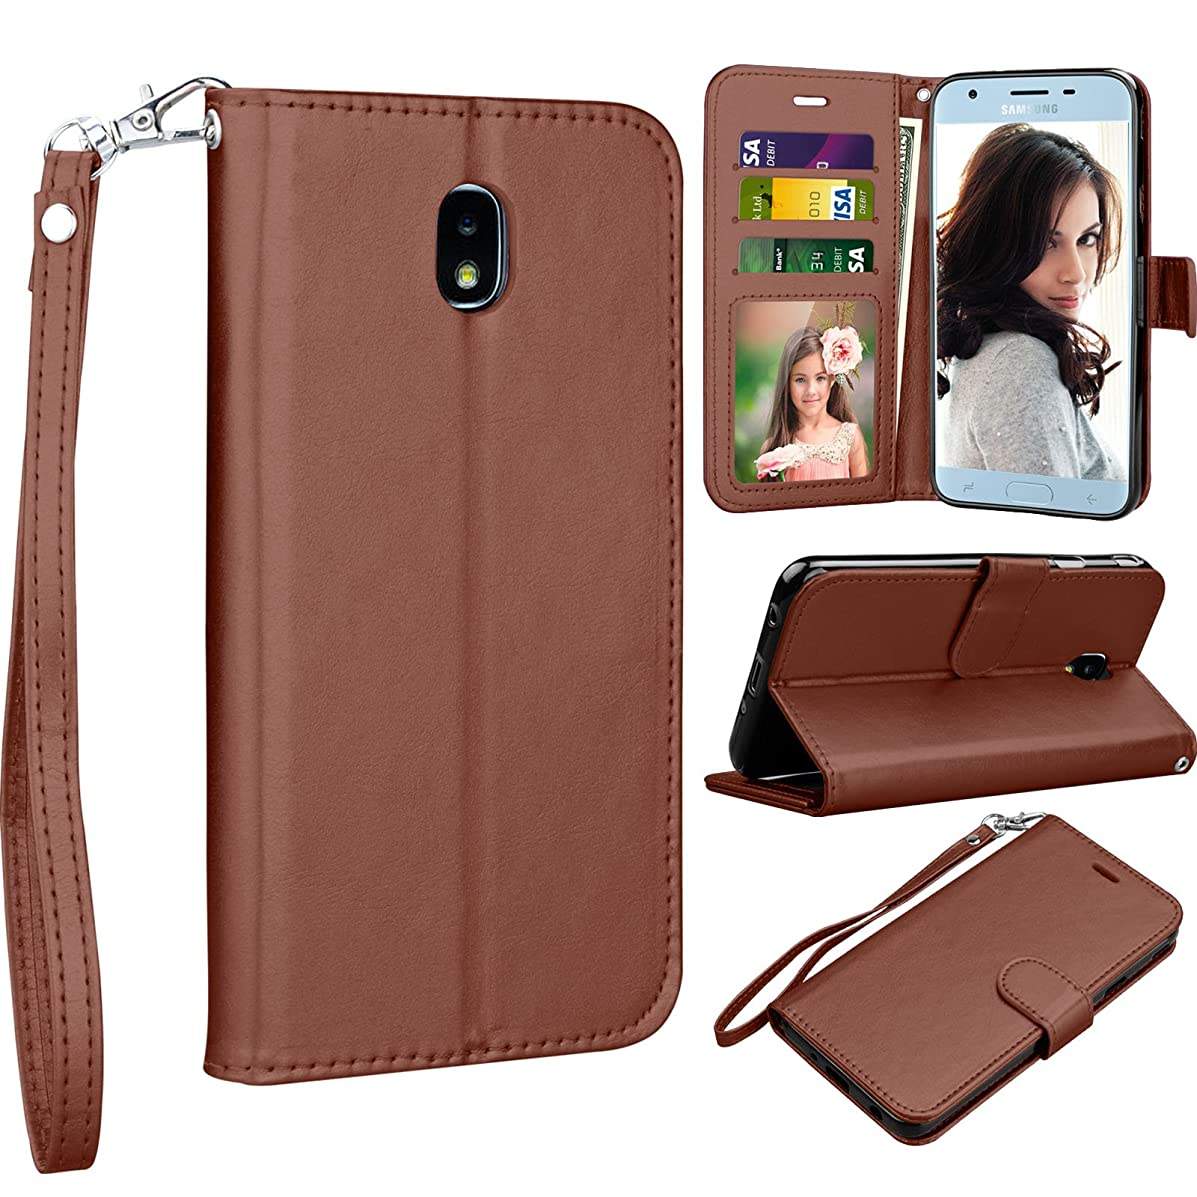 Njjex Galaxy J7 2018/J7 Aero/J7 Aura/J7 Top/J7 Crown/J7 Refine/J7 Eon/J7 Star Wallet Case,[Nallet] PU Leather Flip [Card Slots] [Kickstand] Cover with Magnetic Wrist Strap For Galaxy J7 2018 [Brown]